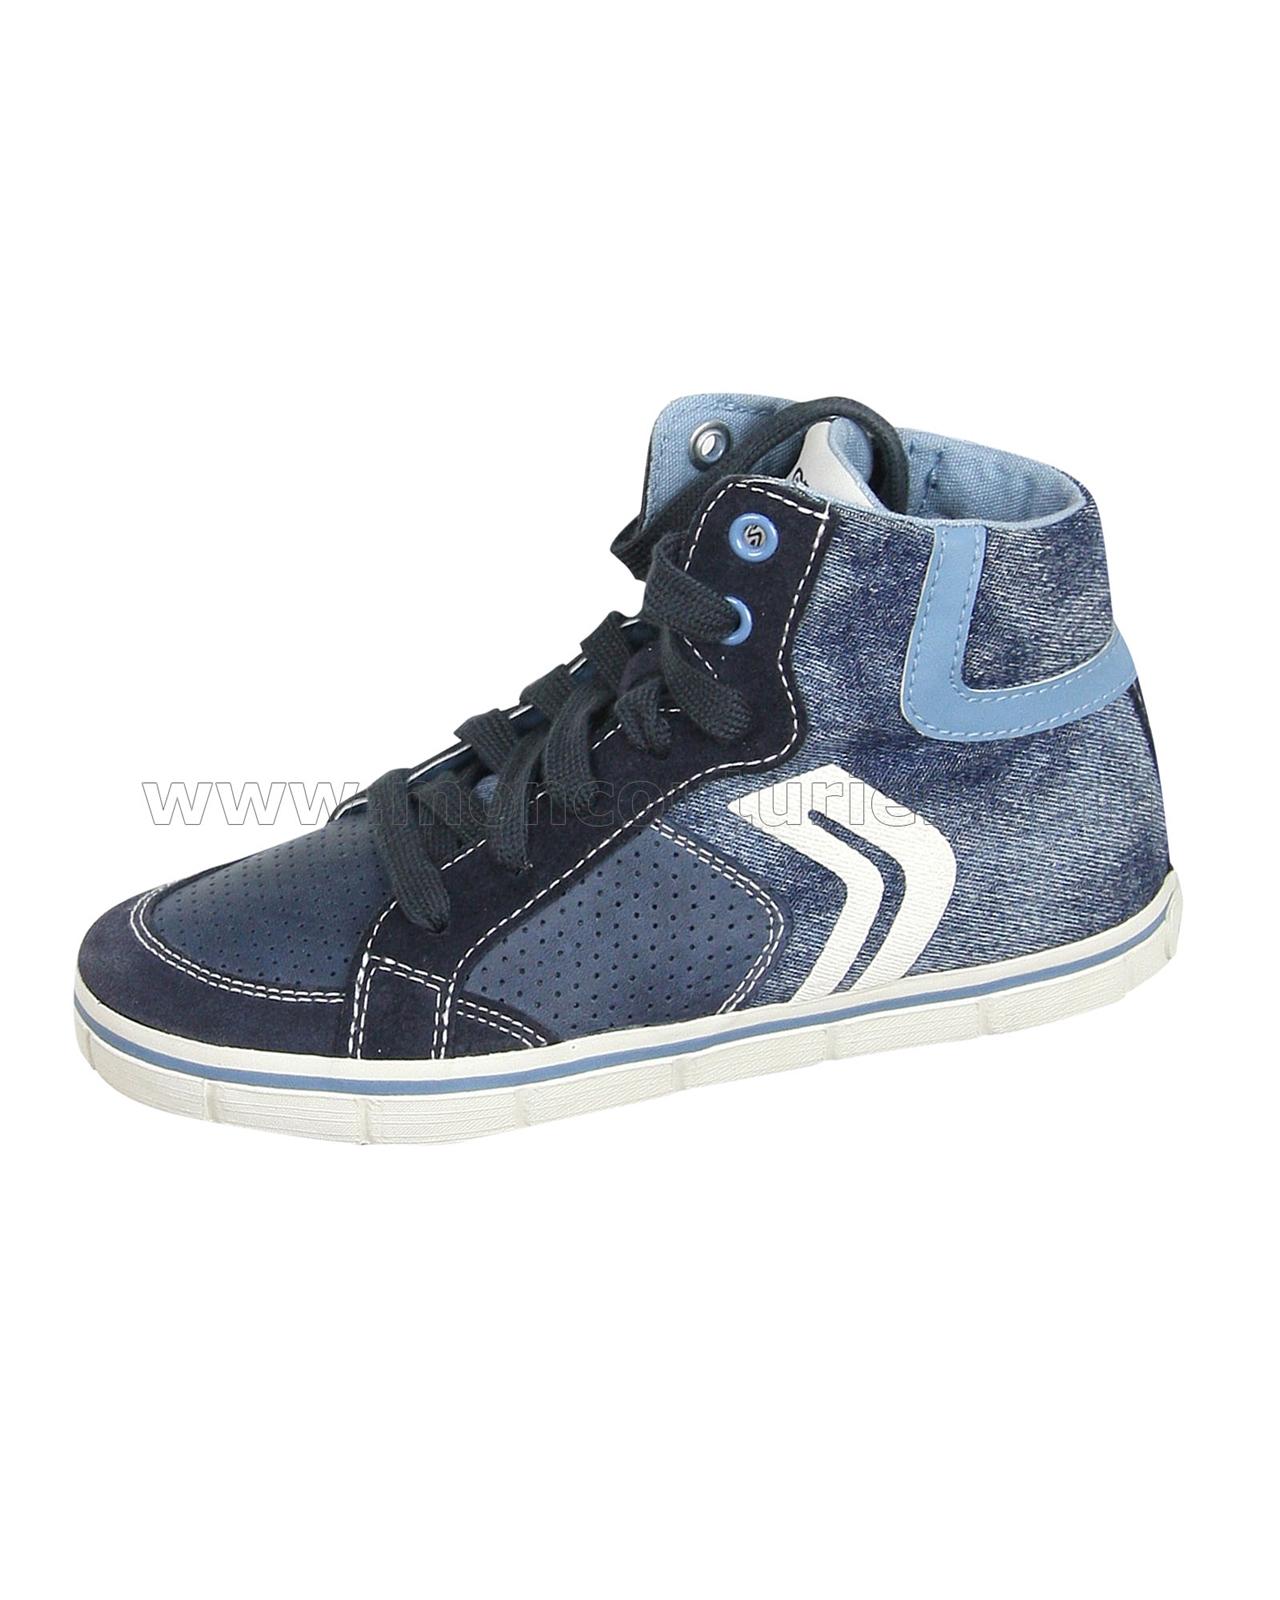 61194828a52 GEOX Boys Hi-top Sneakers Jr Kiwi